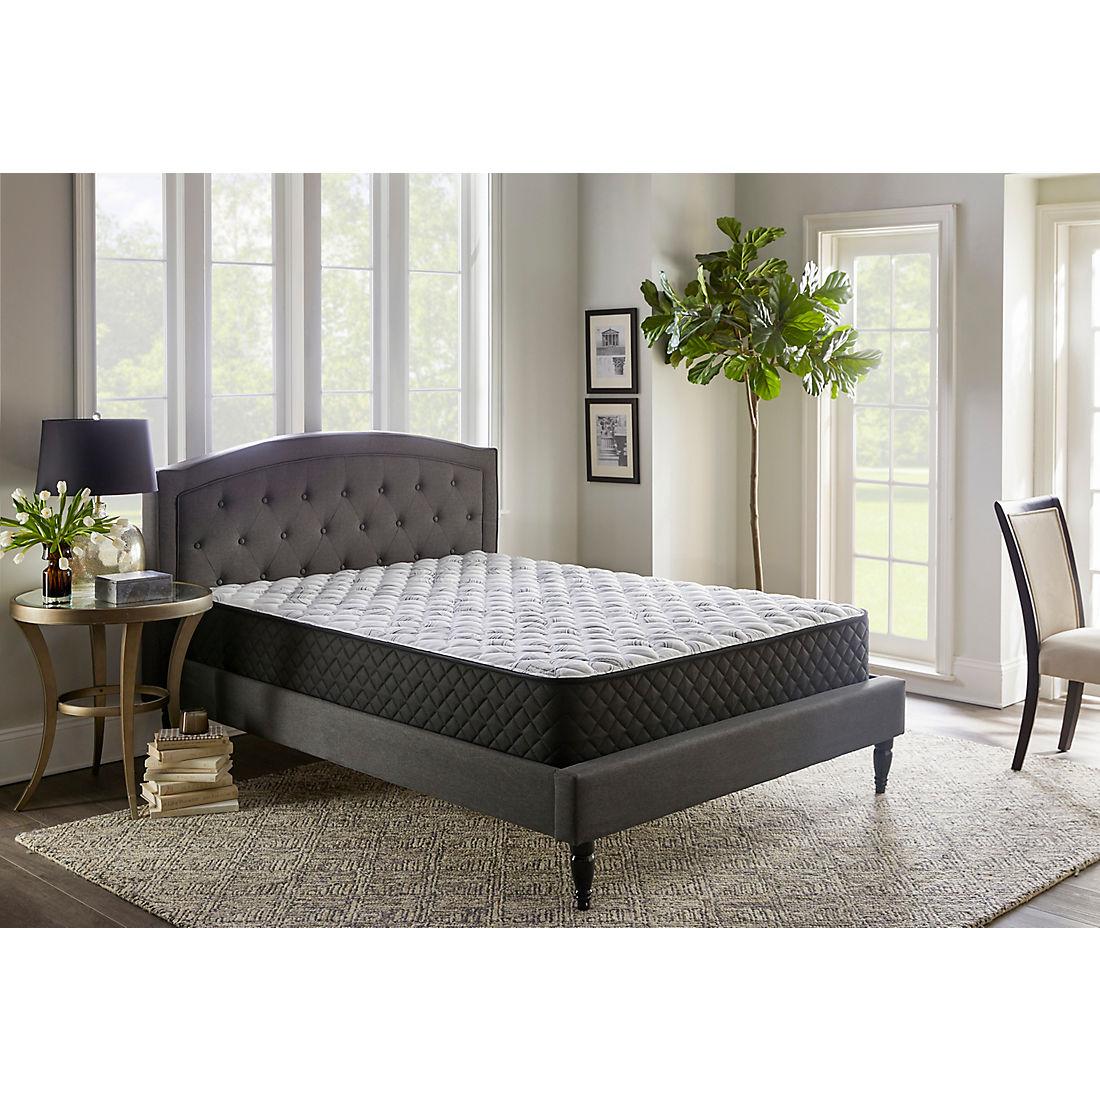 Berkley Jensen Queen Size Firm Support Comfort Select Mattress Bjs Wholesale Club